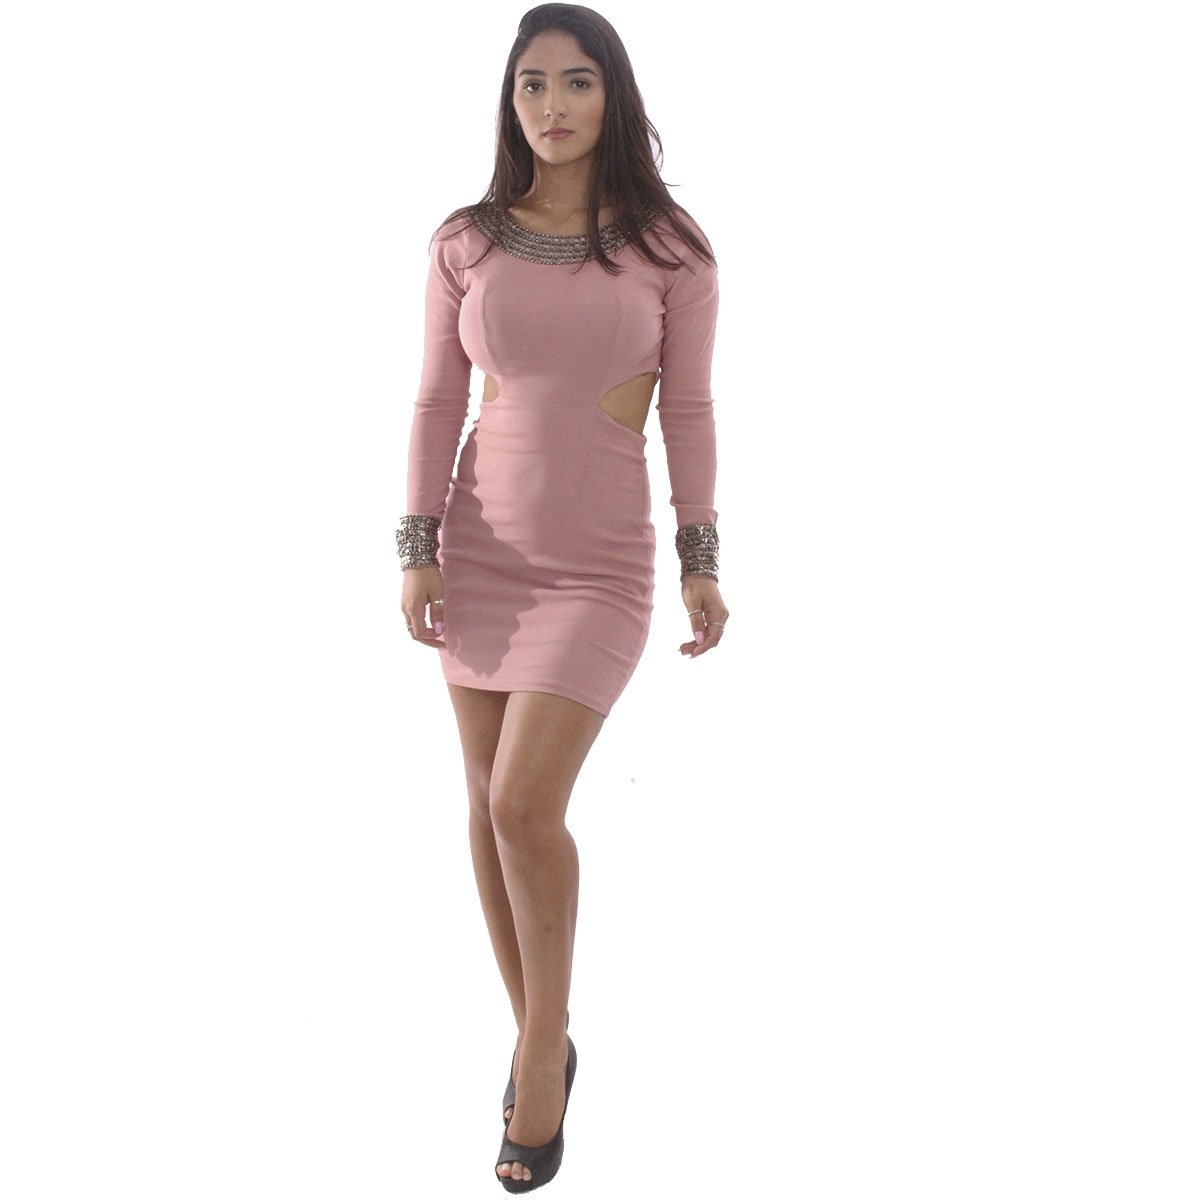 c788dd454 Vestido Rosa Fina Manga Longa Com Pedrarias | Zattini